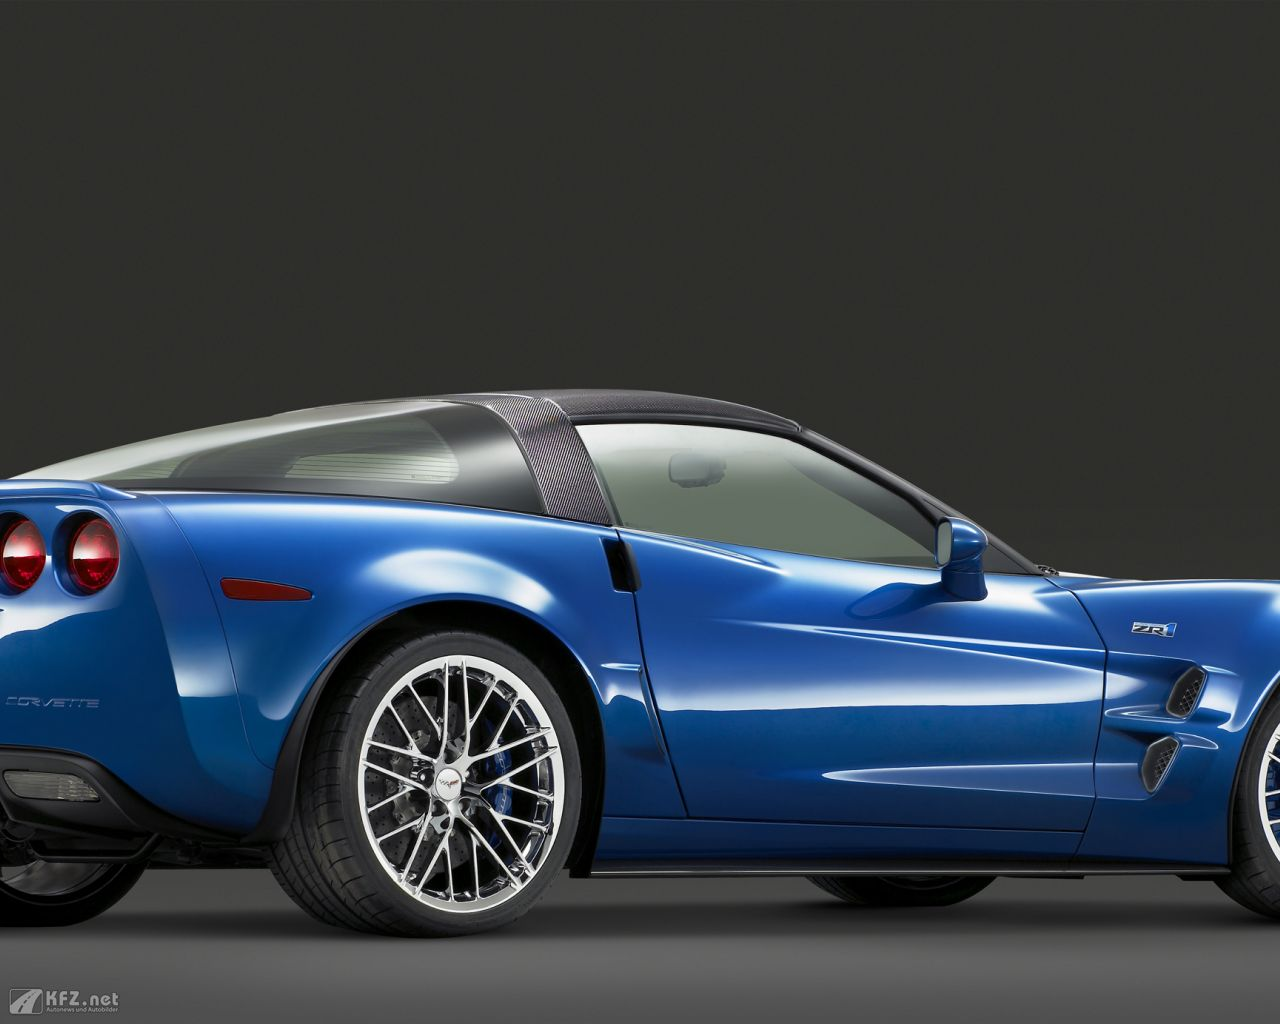 chevrolet-corvette-1280x1024-11